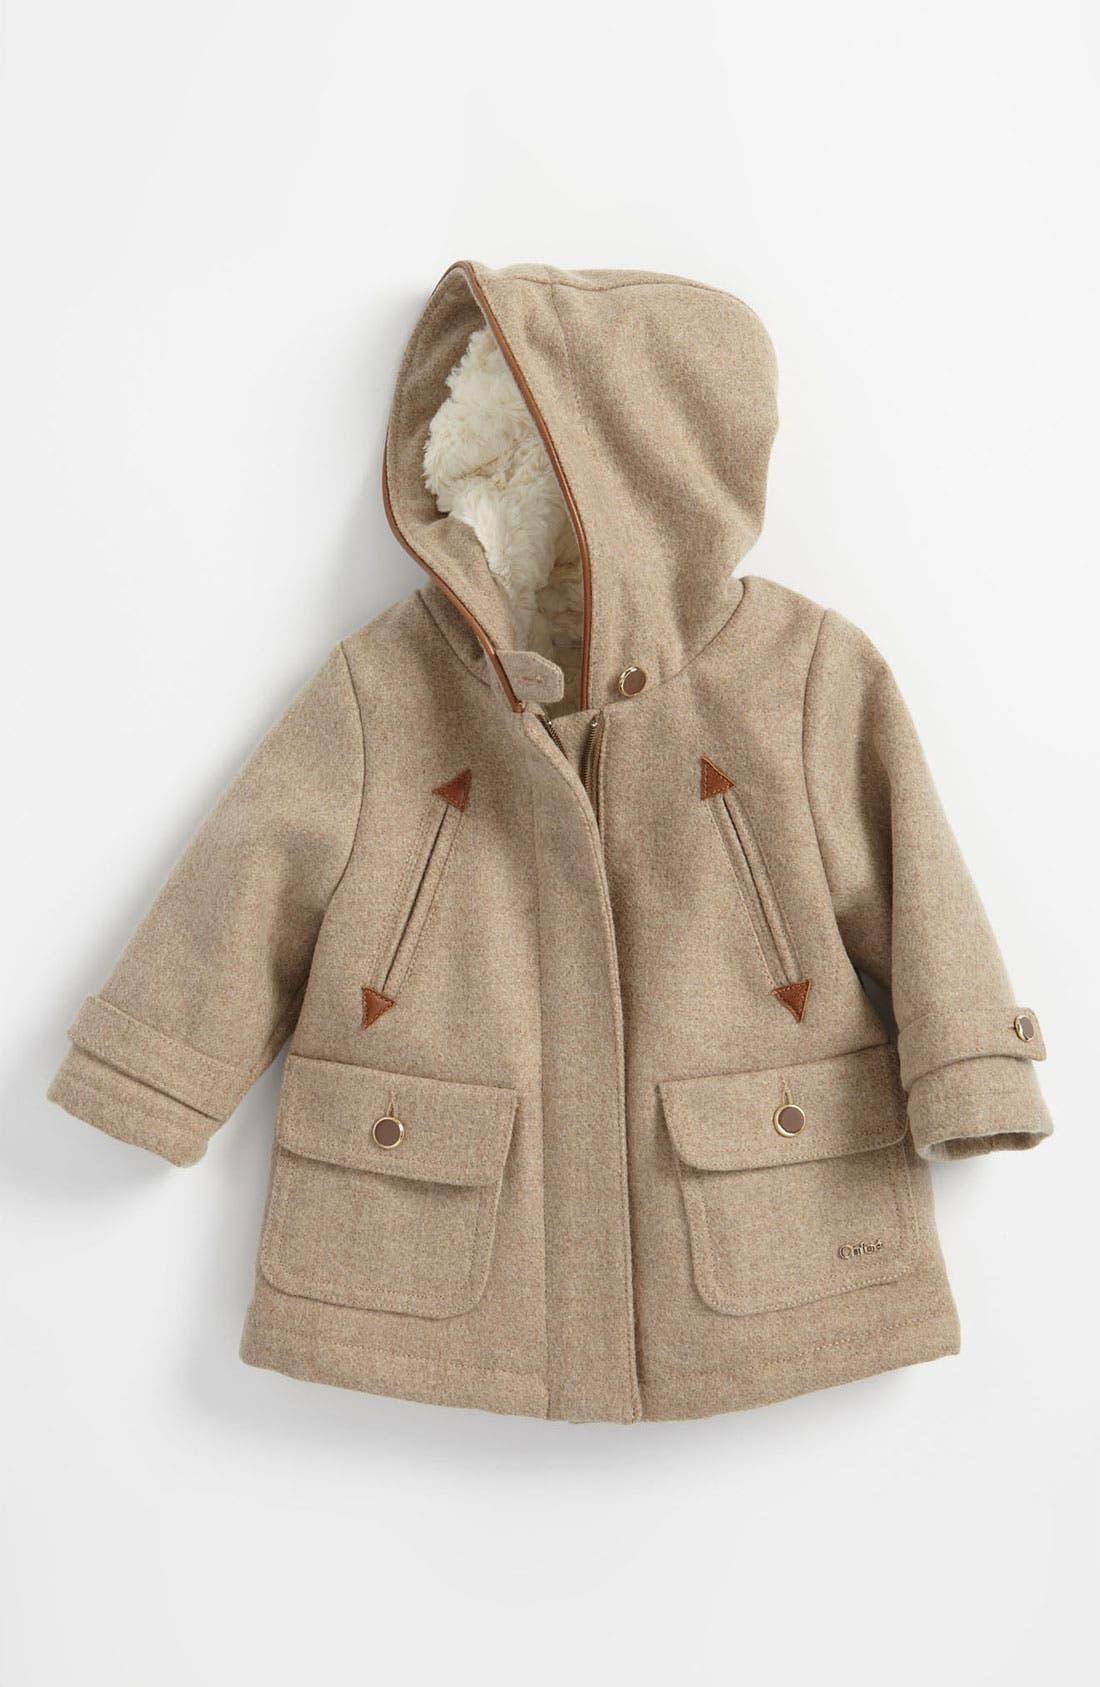 Main Image - Chloé Wool Blend Hooded Coat (Toddler)